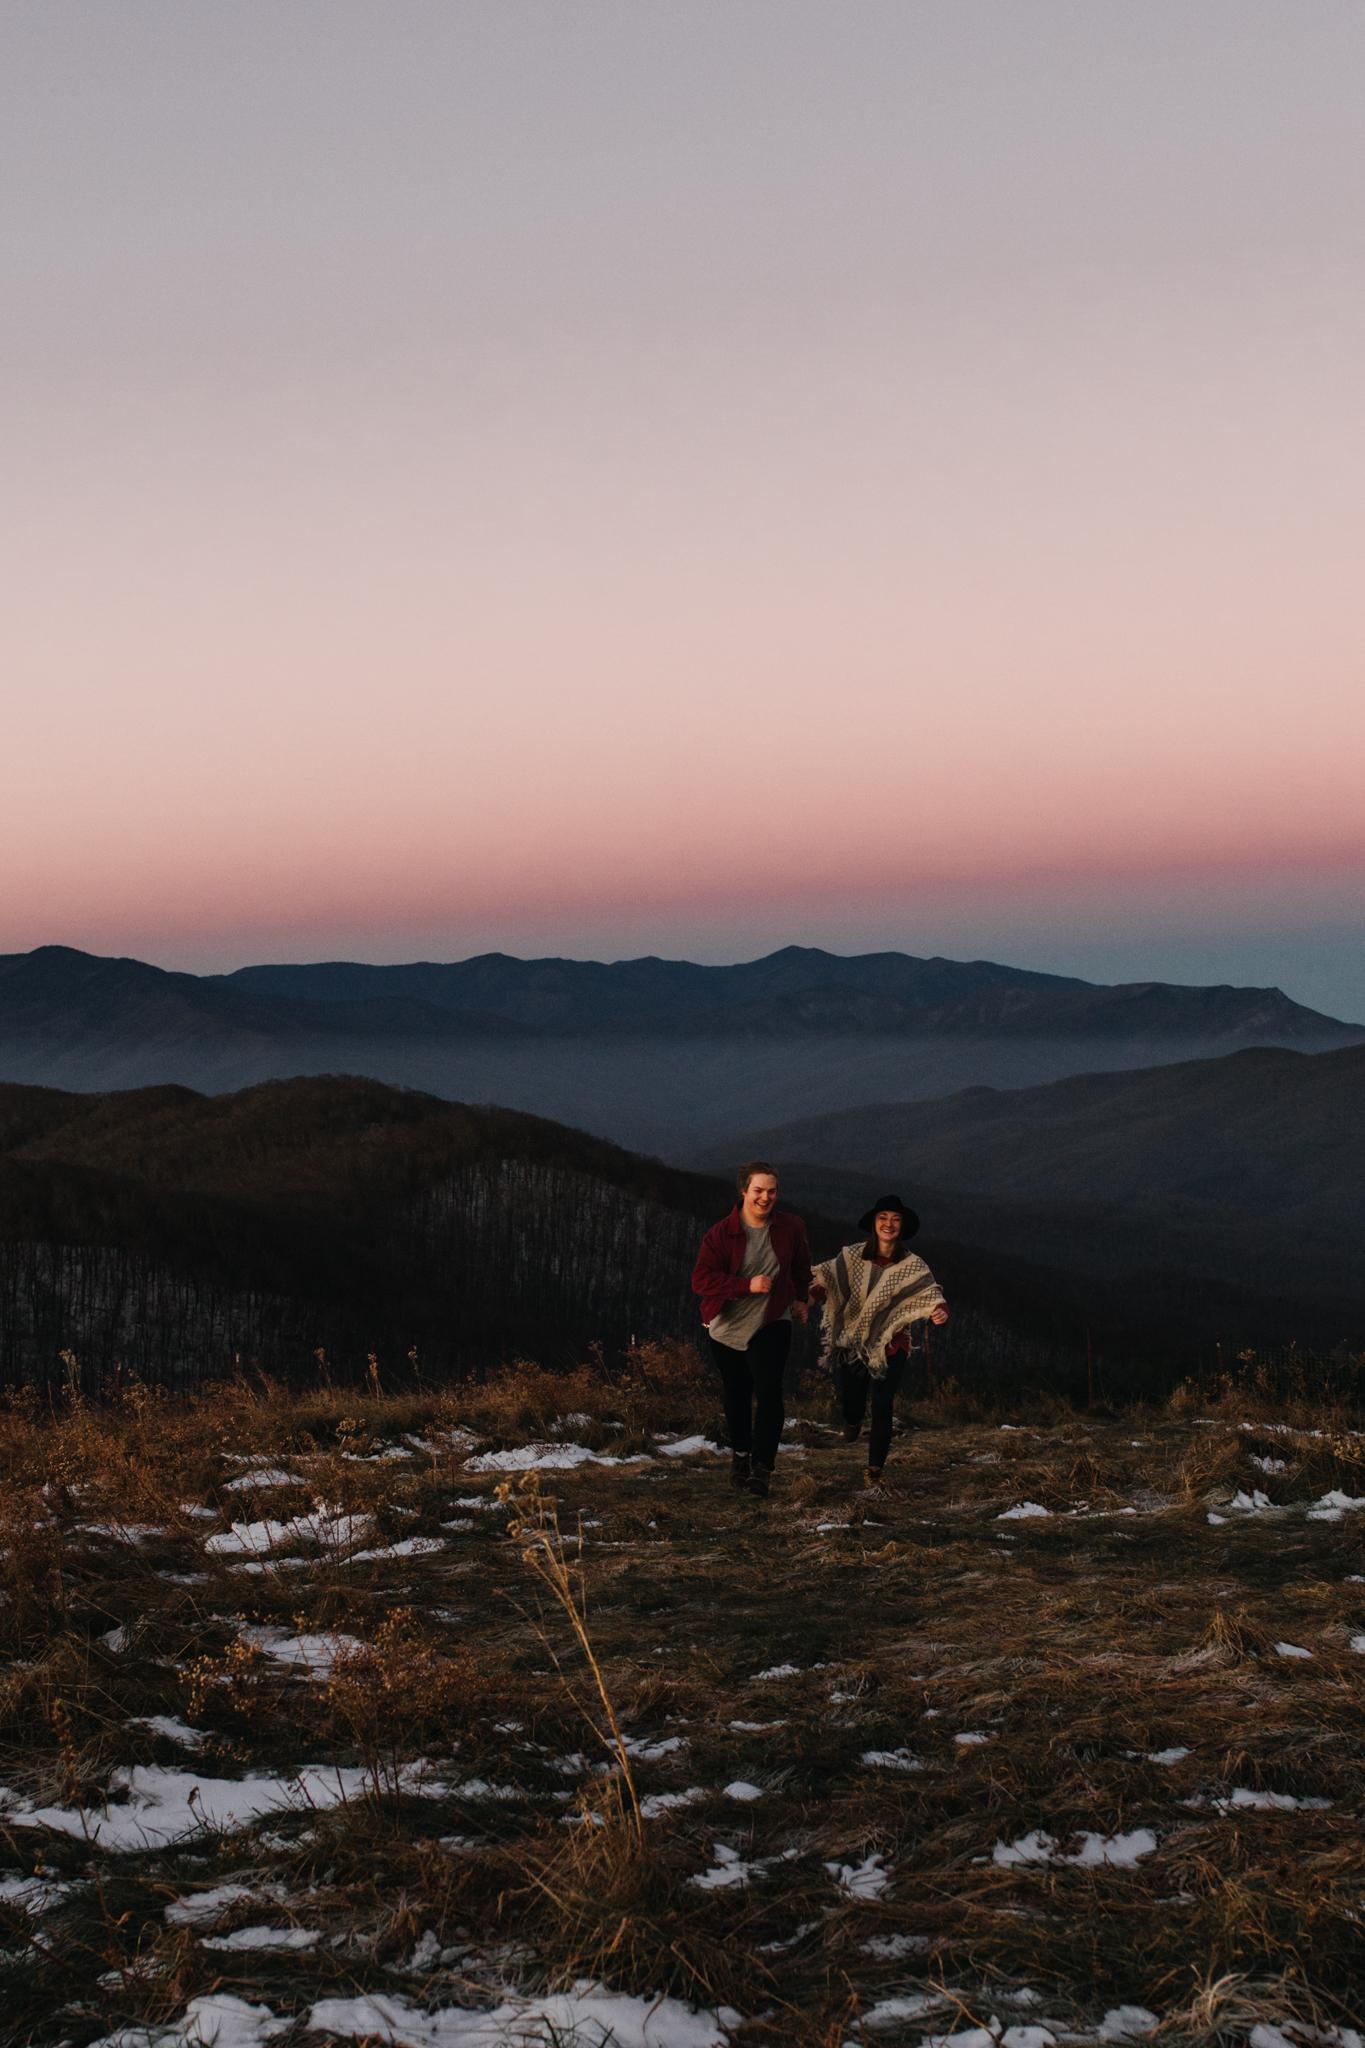 MonicaLeavellPhoto-MaxPatch-NorthCarolina-Adventure-Elopement-Photographer-JessandRemy-17.jpg